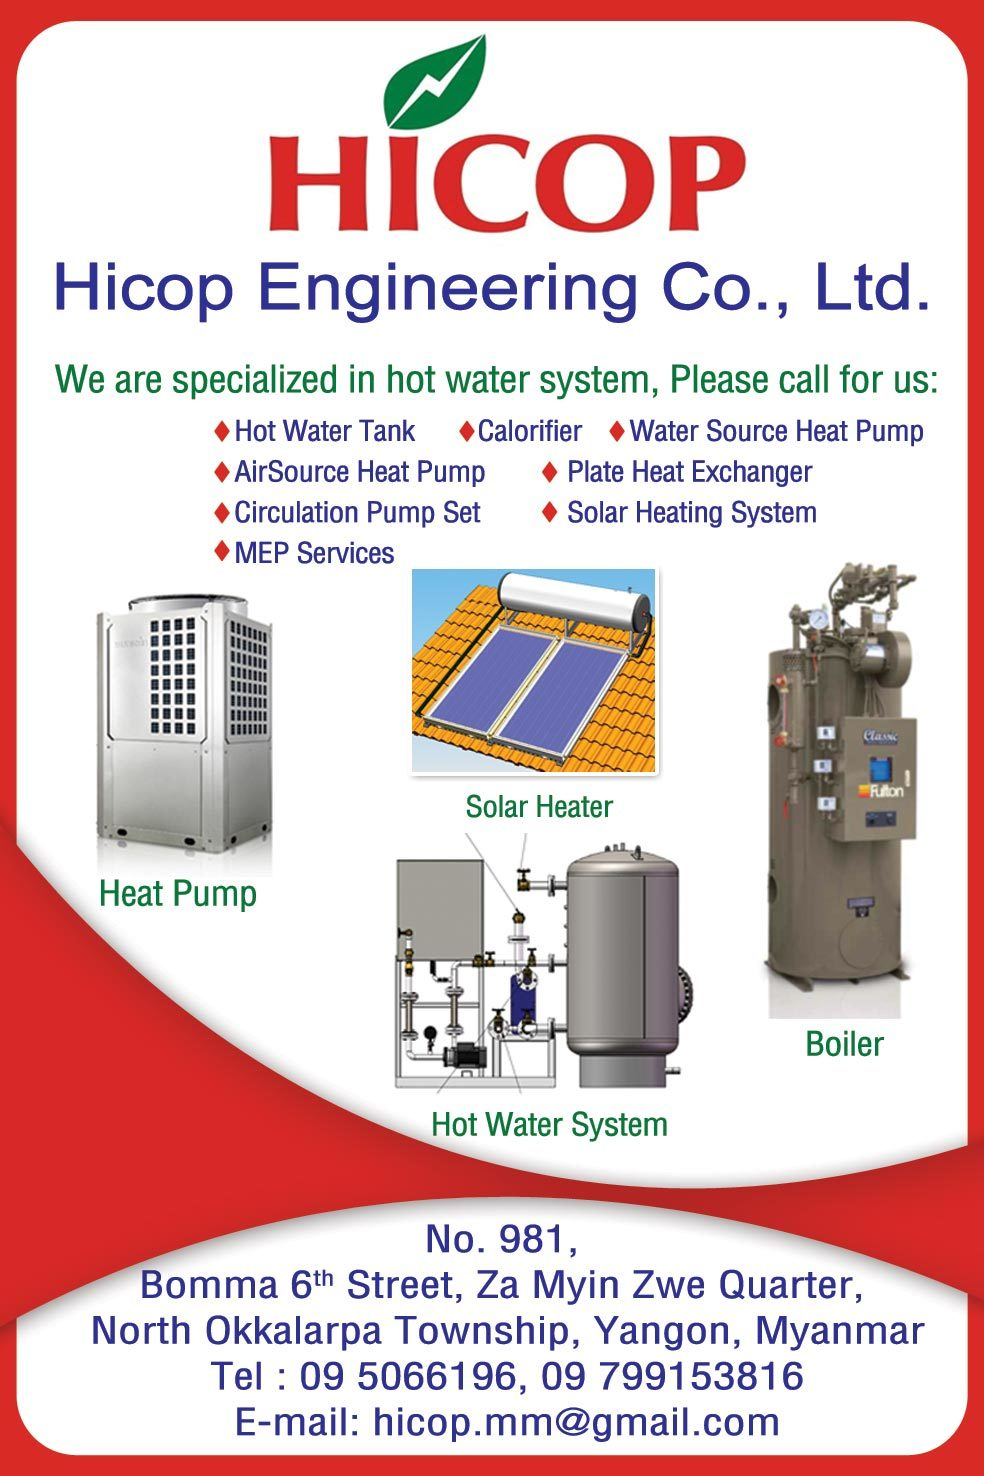 Hicop-Engineering-Co-Ltd_Water-Heater_3223.jpg